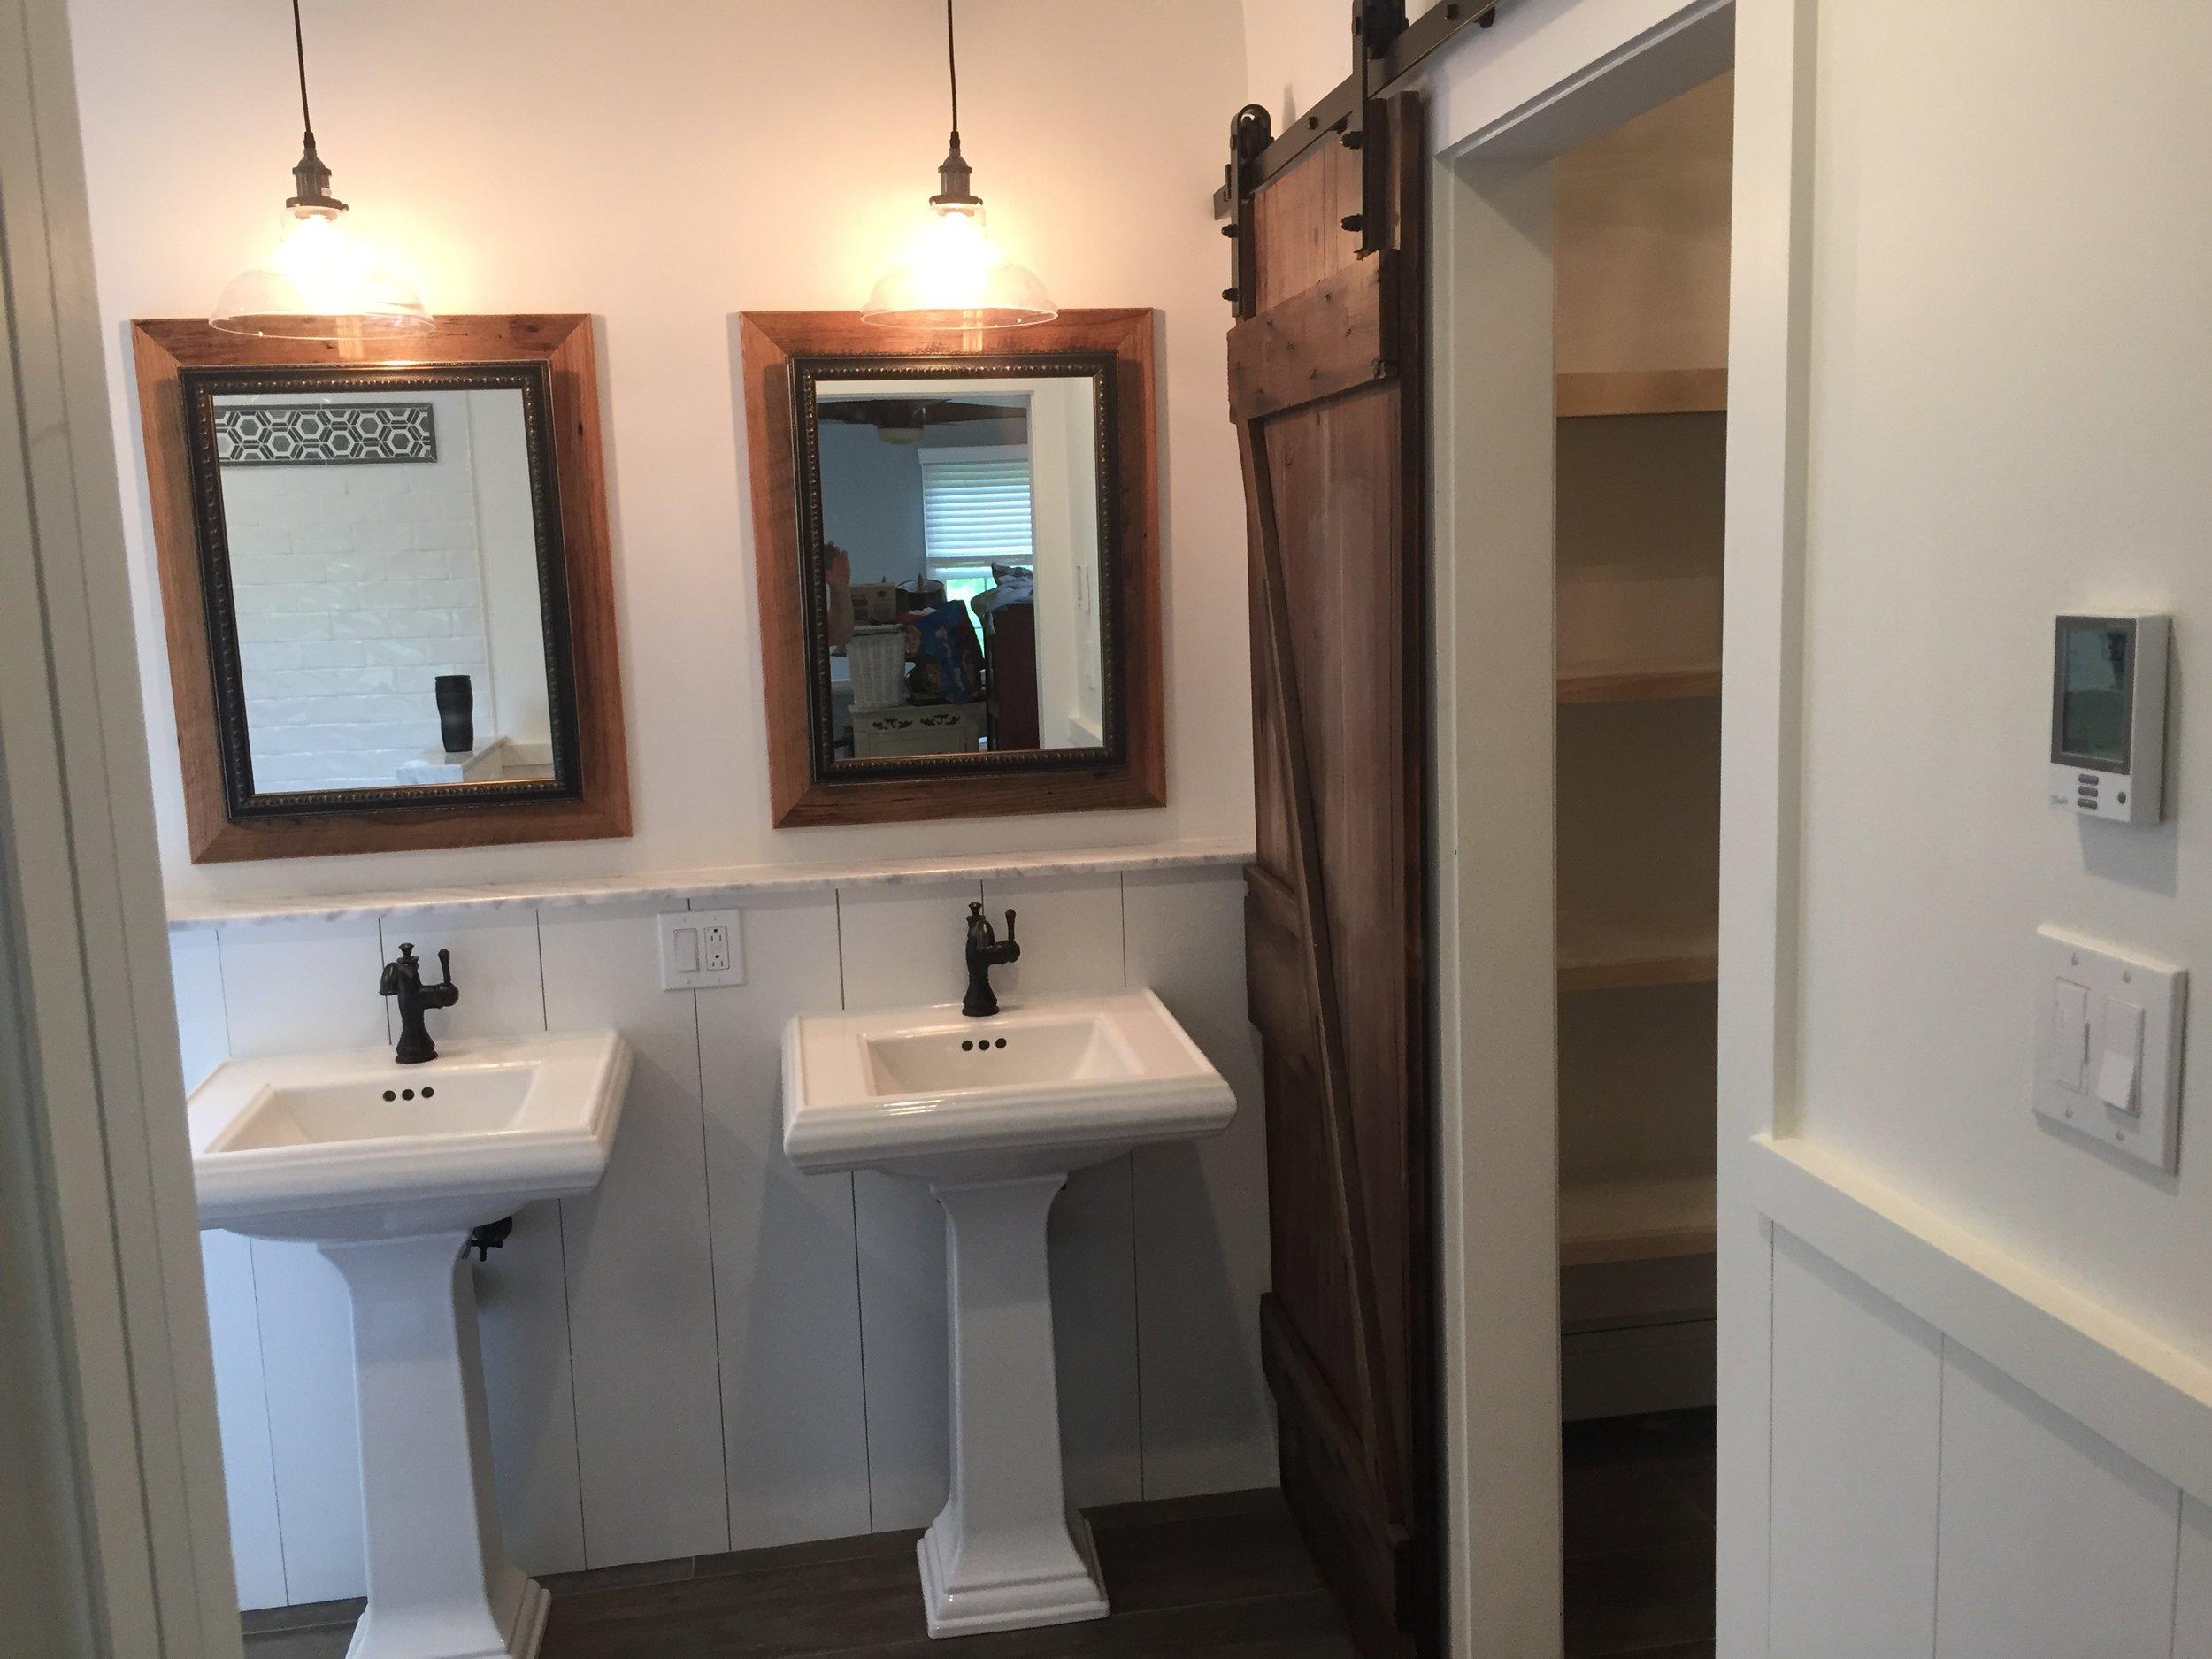 terri feralio - finished bathroom (2).JPG